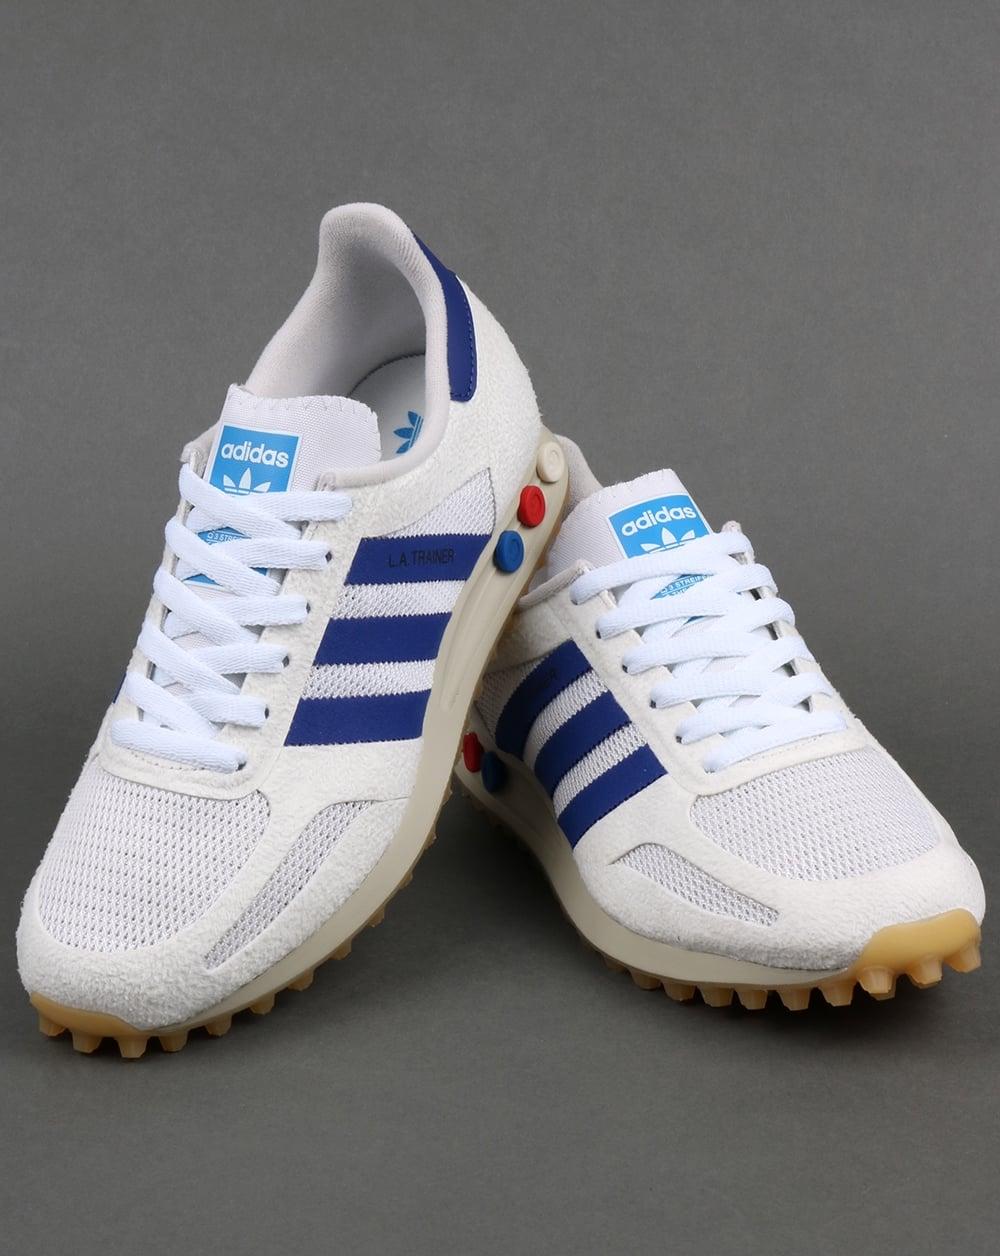 Adidas La Trainer OG Vintage WhiteMystery Ink | Adidas